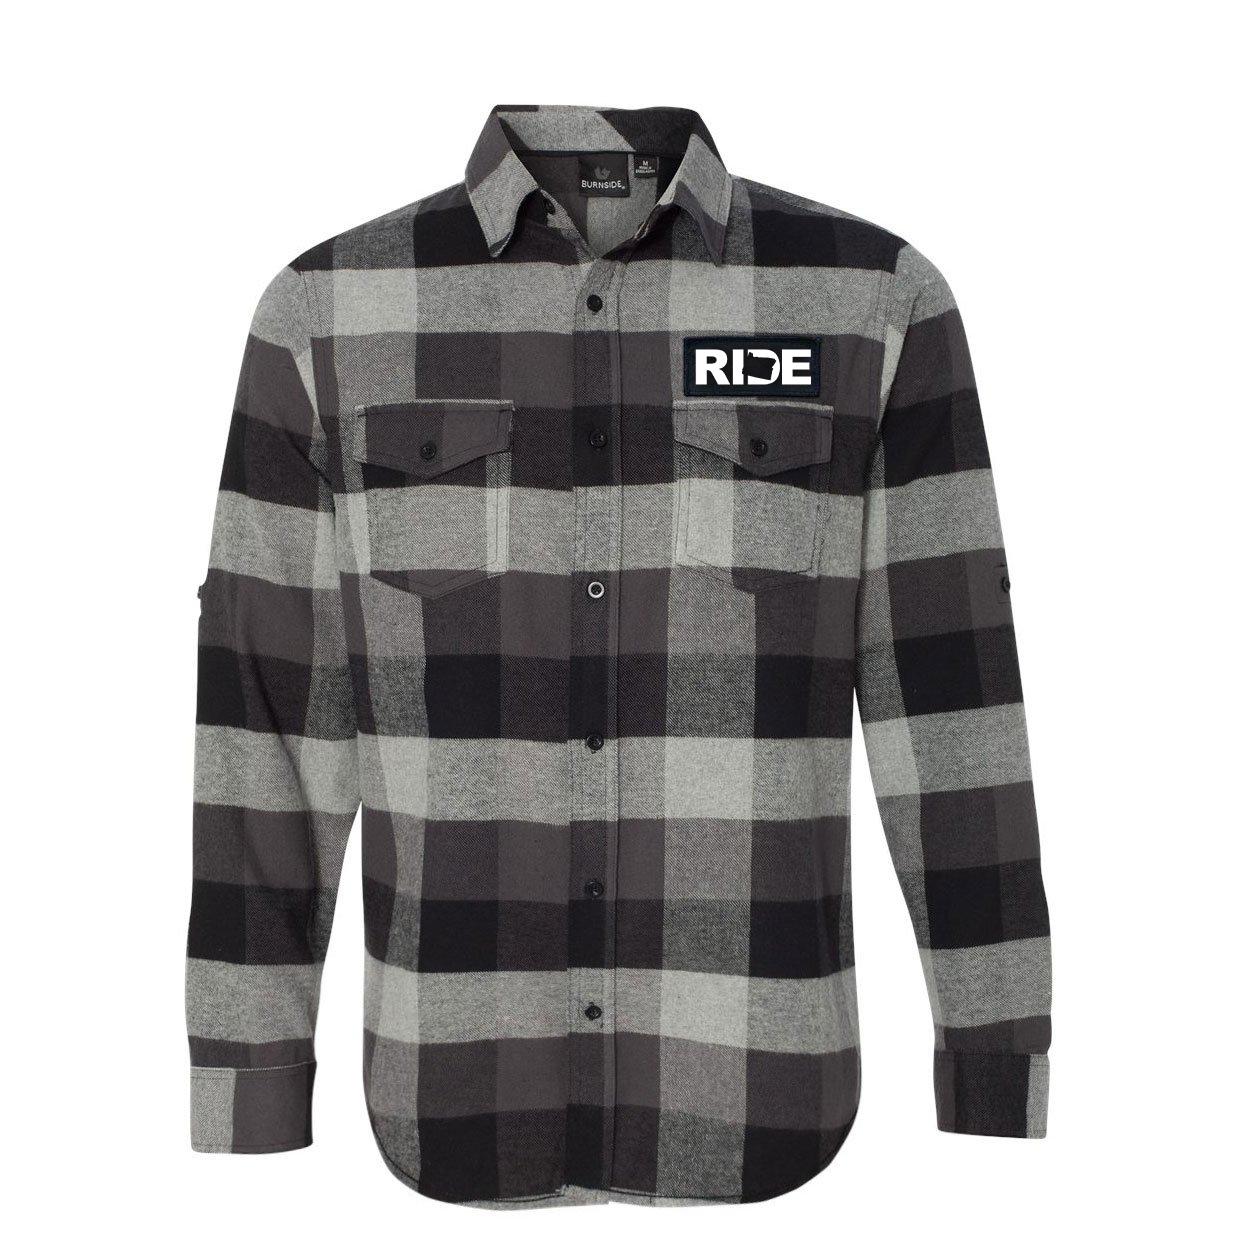 Ride Oregon Classic Unisex Long Sleeve Woven Patch Flannel Shirt Black/Gray (White Logo)